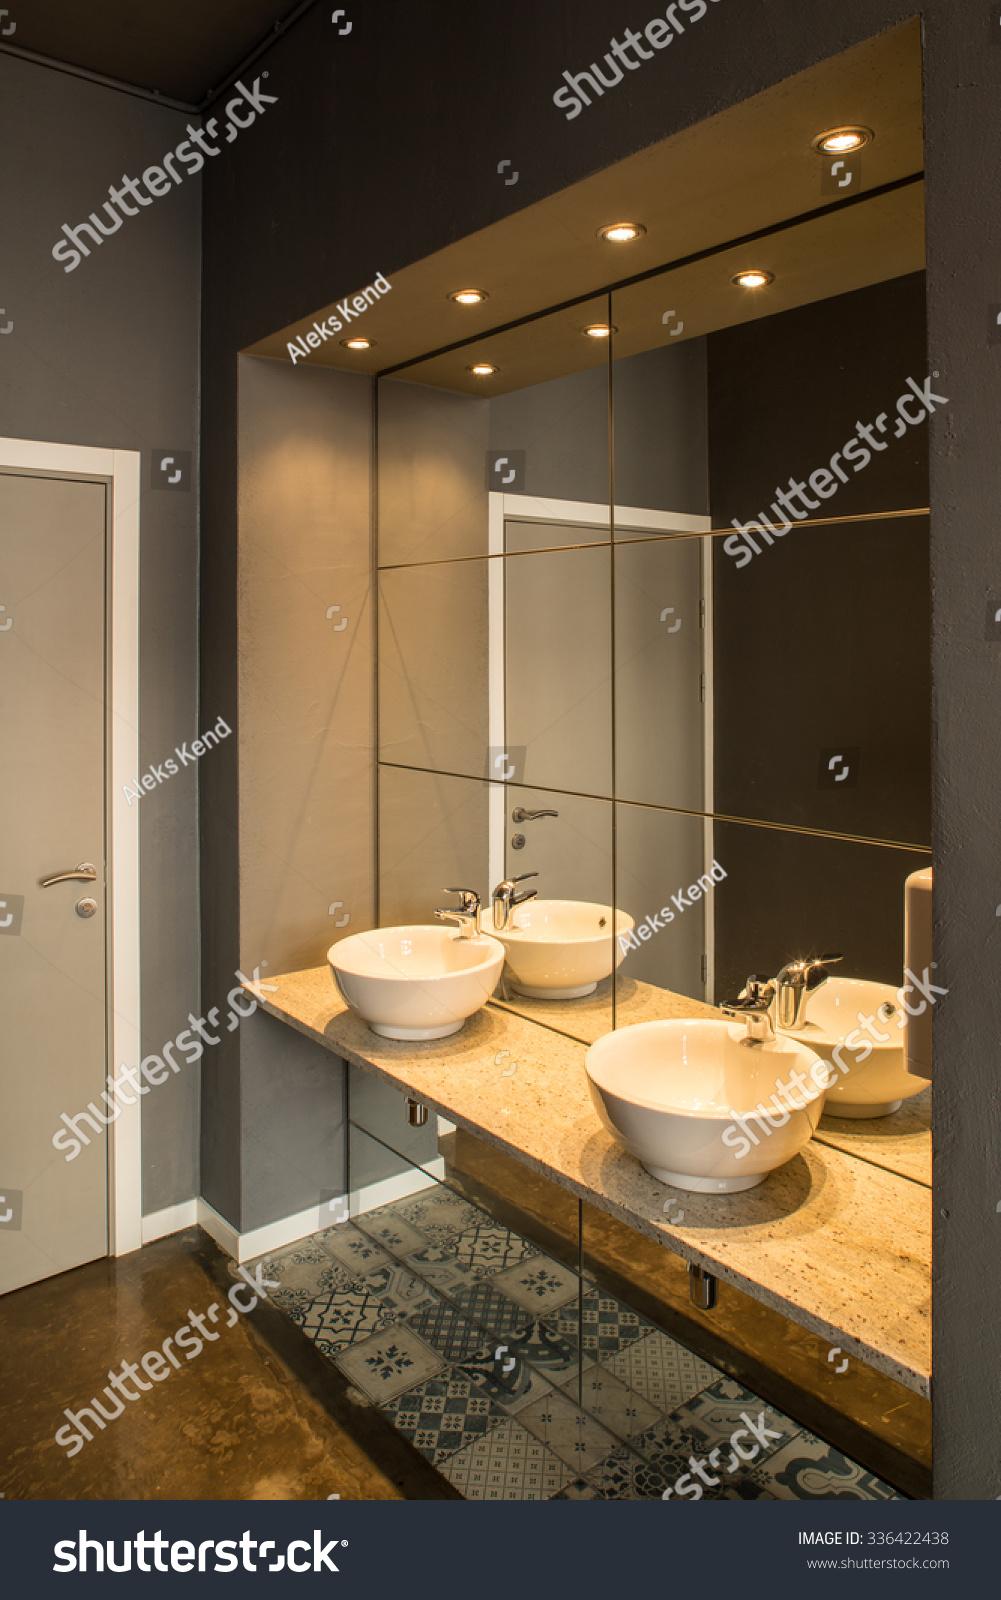 Interior Of Restaurant. Washroom, Sink. Stock Photo 336422438 : Shutterstock